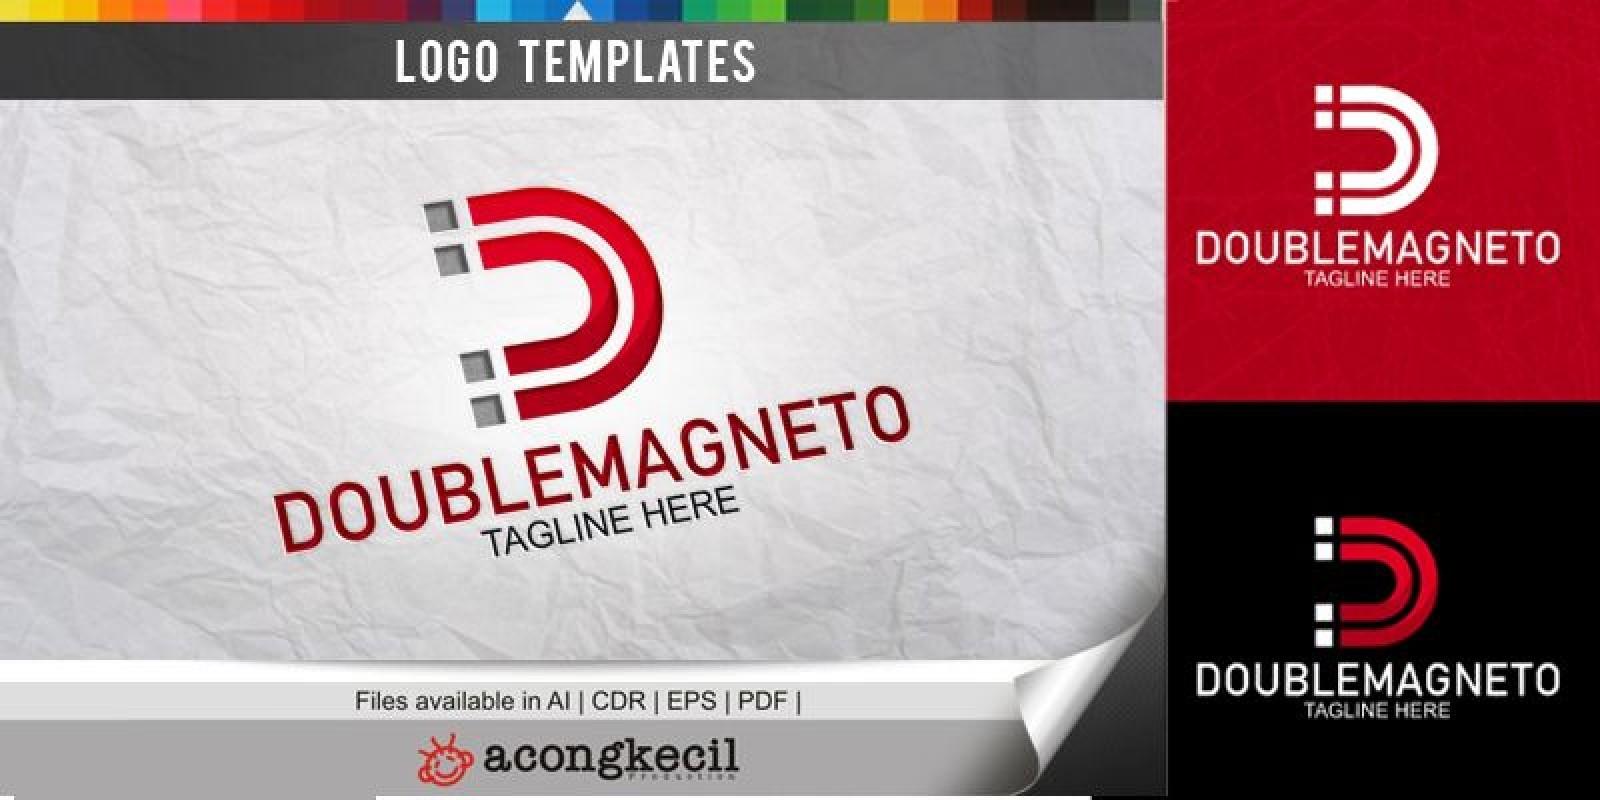 Double Magneto - Logo Template